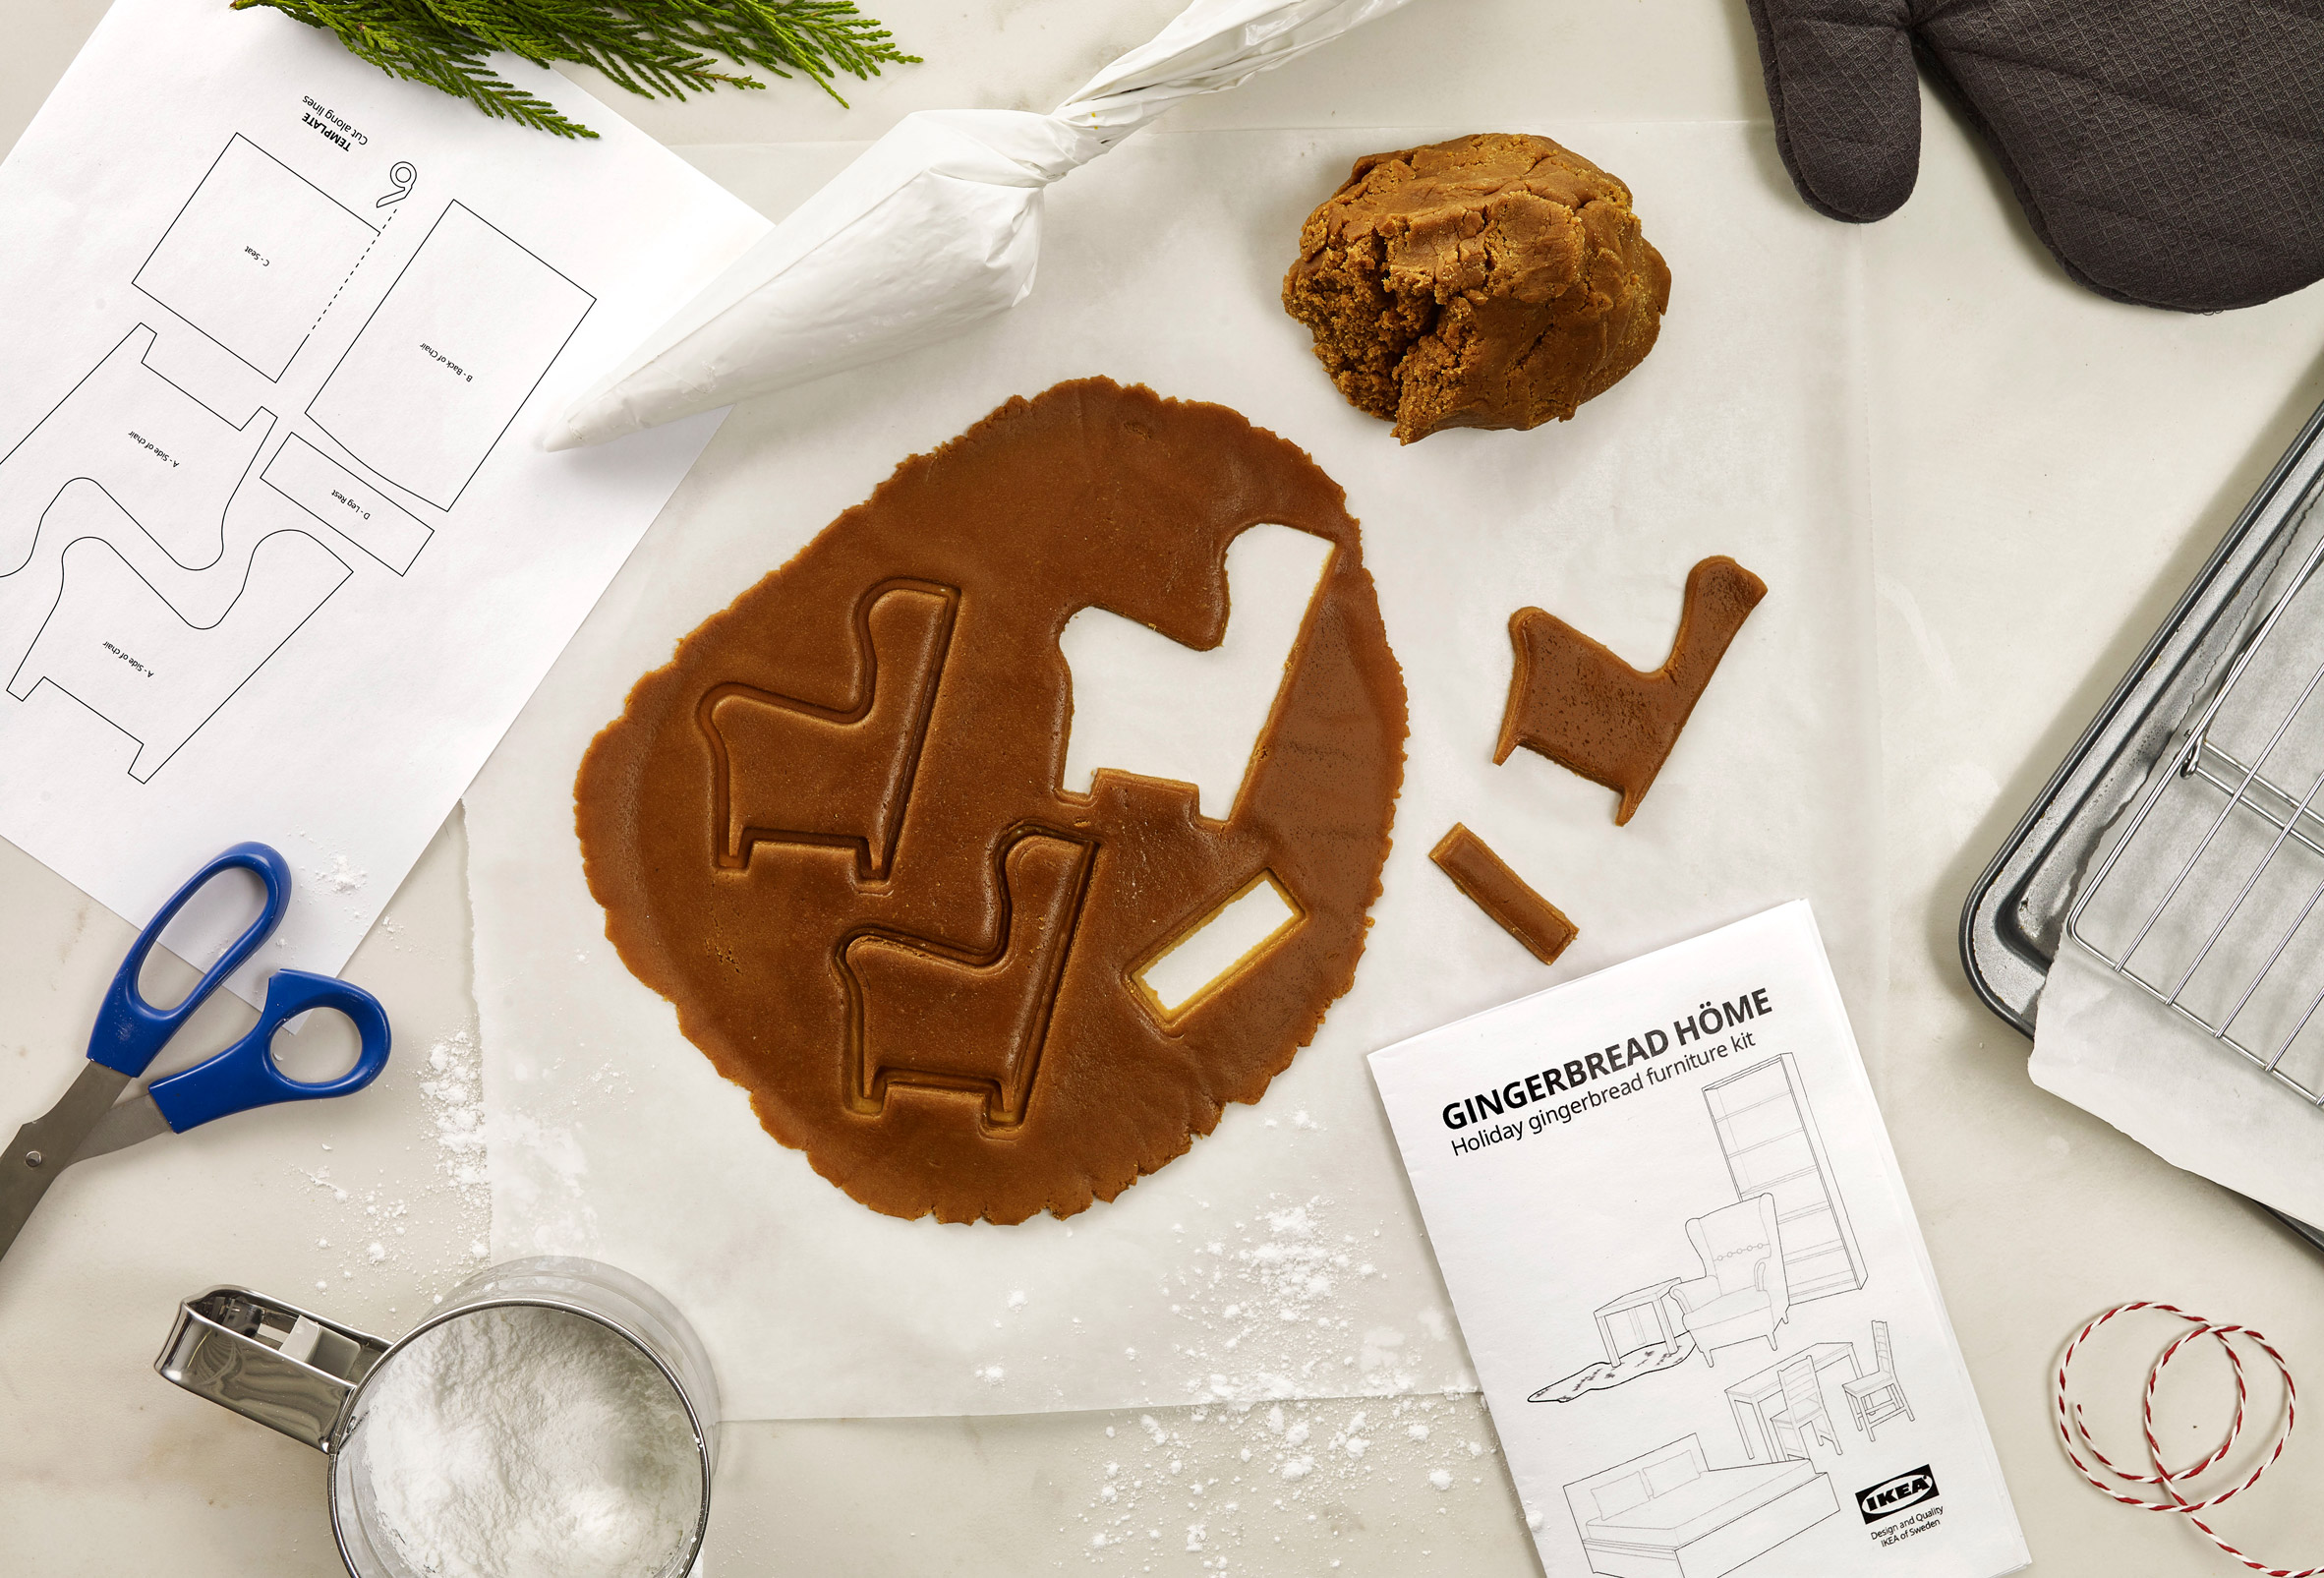 Gingerbread Strandmon chair from IKEA Gingerbread Höme kit